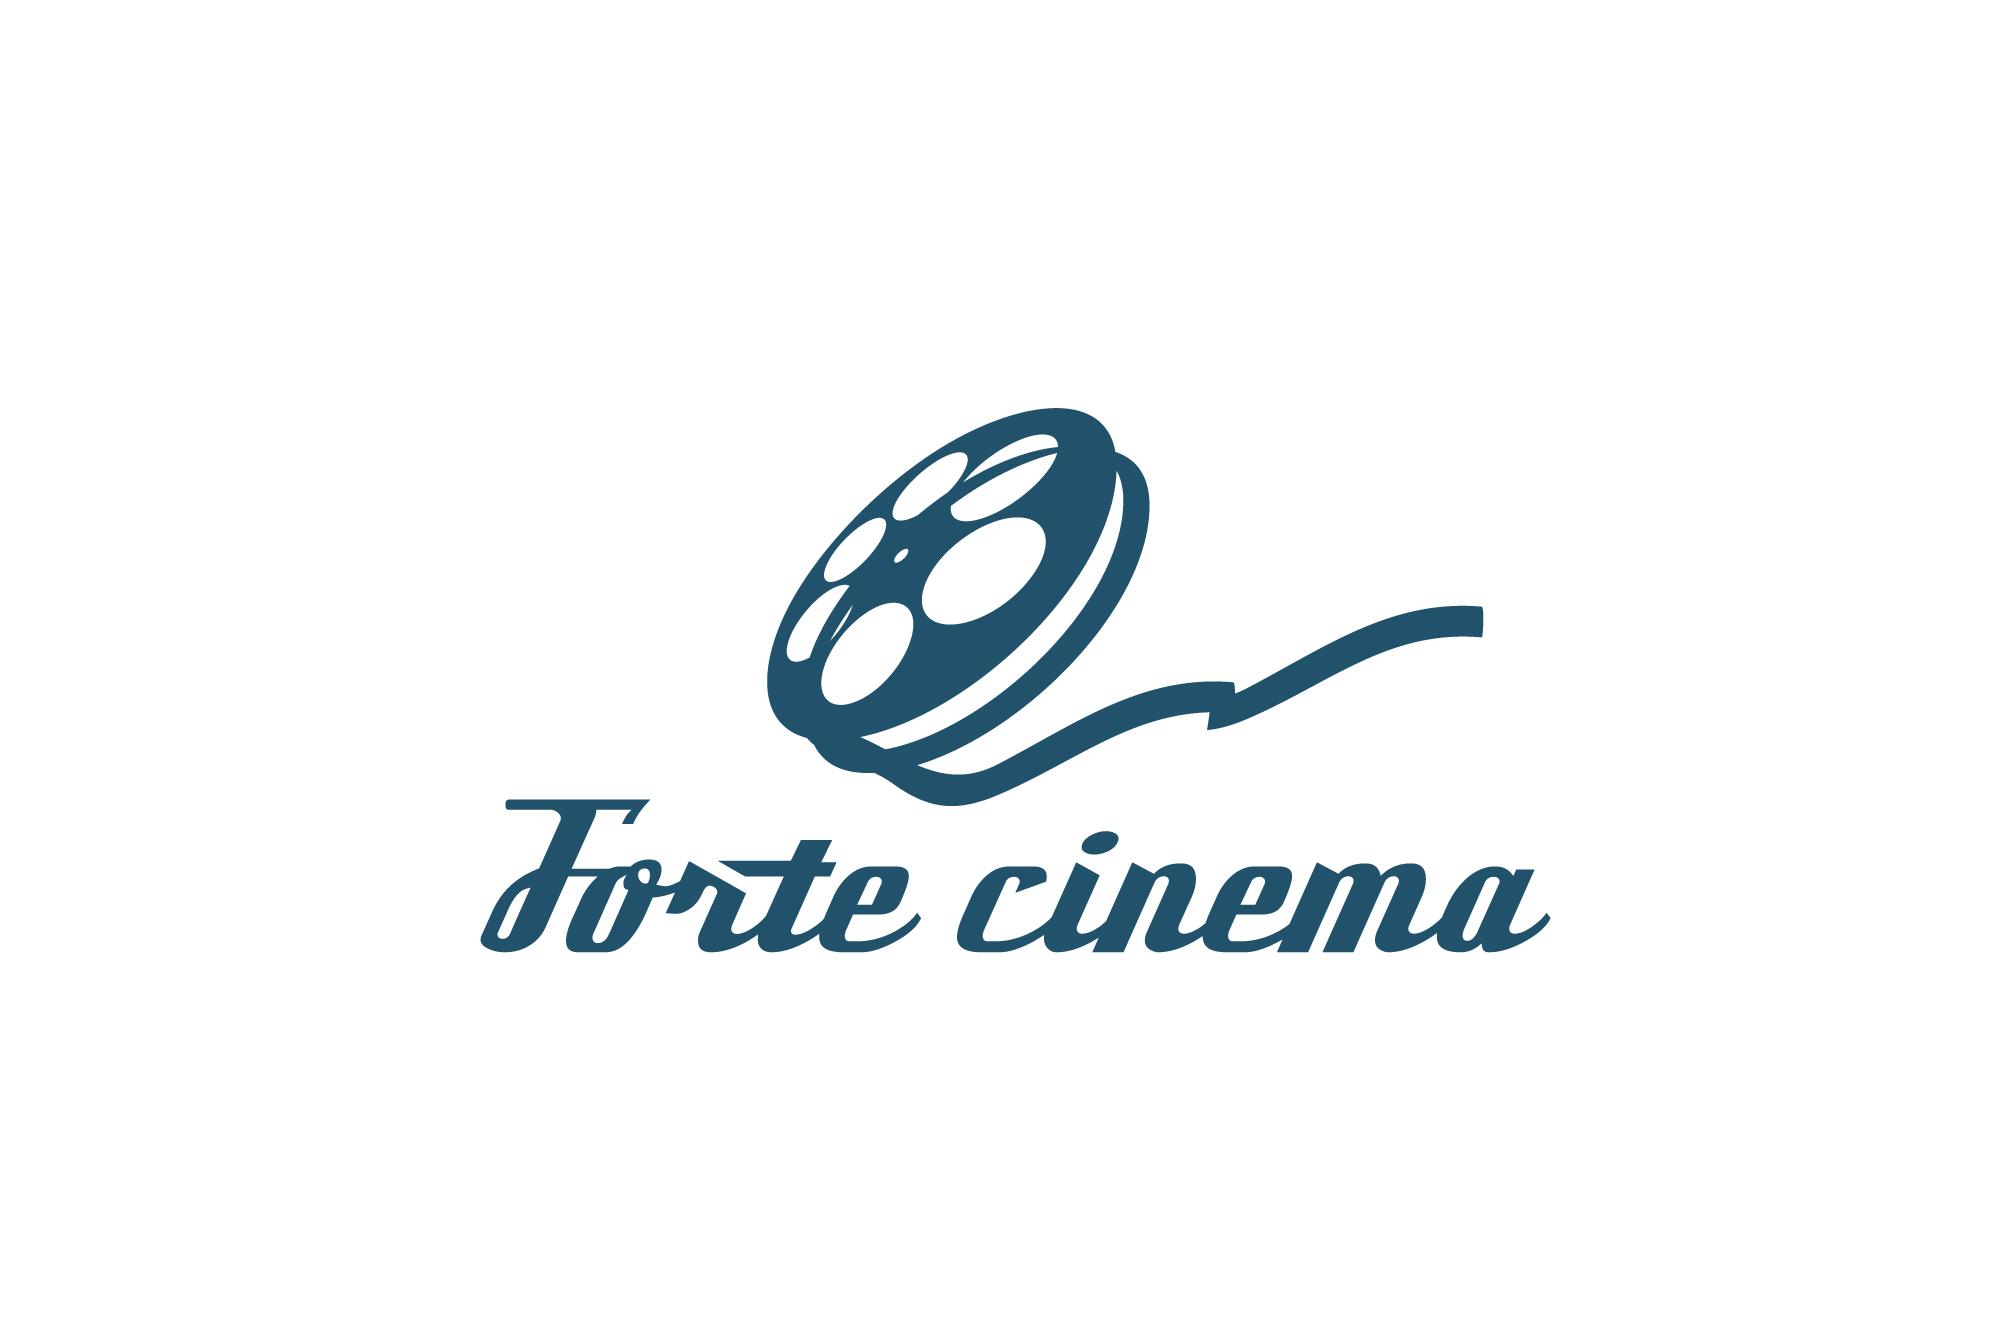 Forte cinema